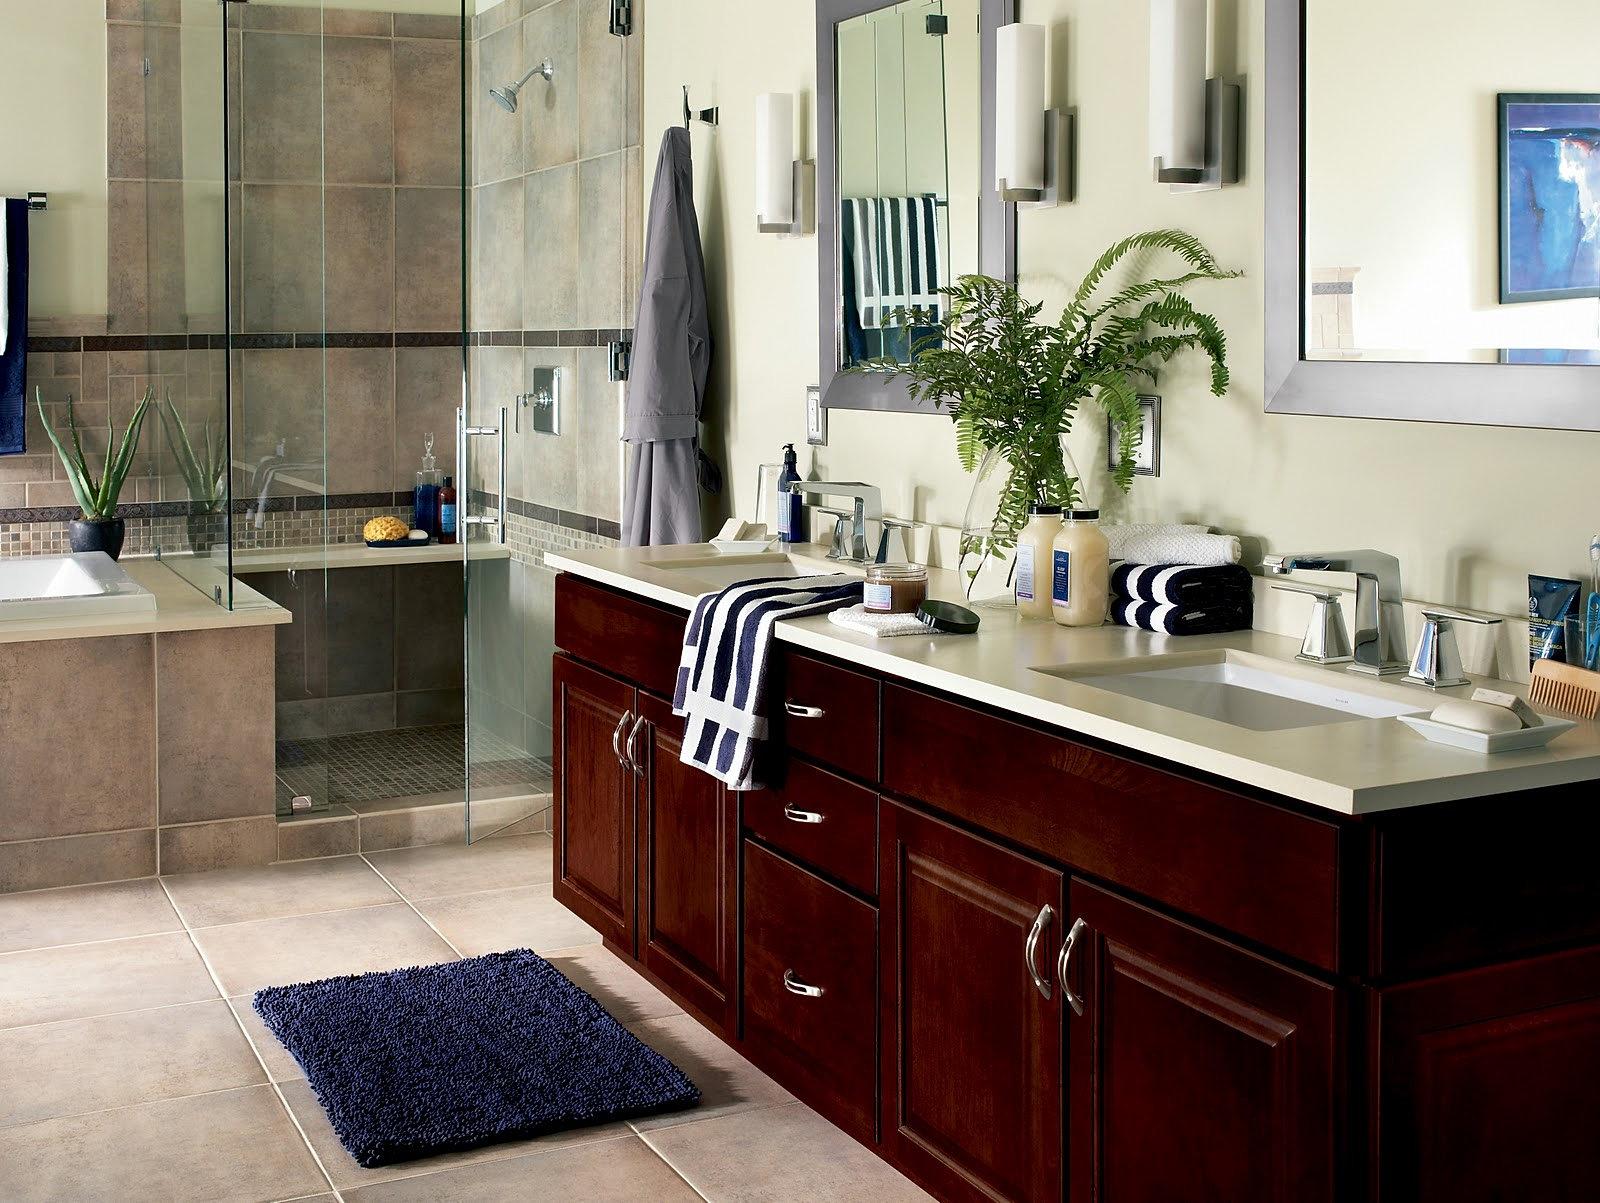 mandrbathrooms kitchen and bathroom remodeling Master Bath Remodel